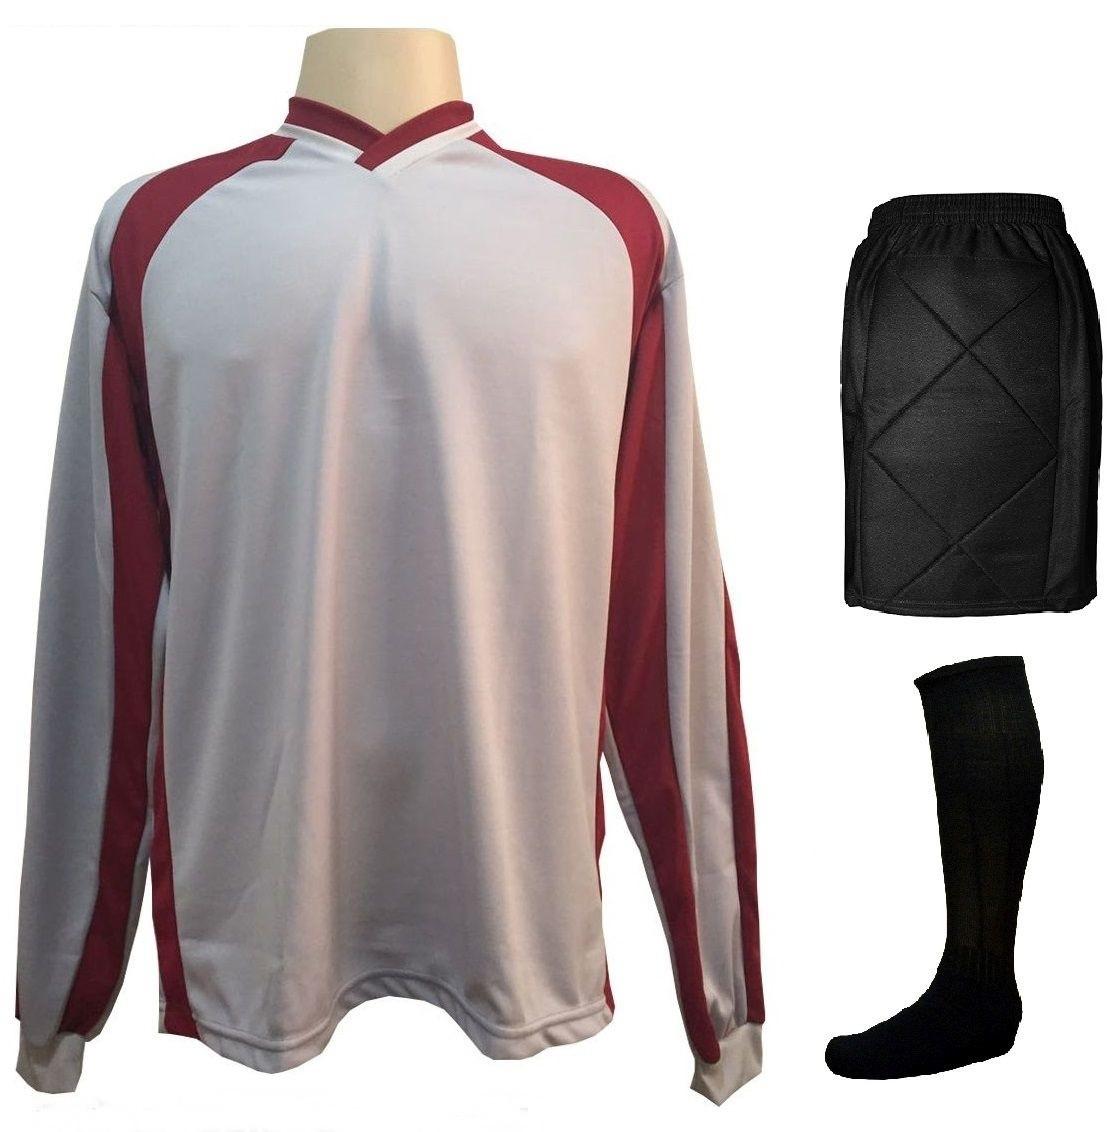 Fardamento Completo modelo Milan 20+1 (20 camisas Preto/Amarelo + 20 calções modelo Copa Preto/Amarelo + 20 pares de meiões Preto + 1 conjunto de goleiro) + Brindes